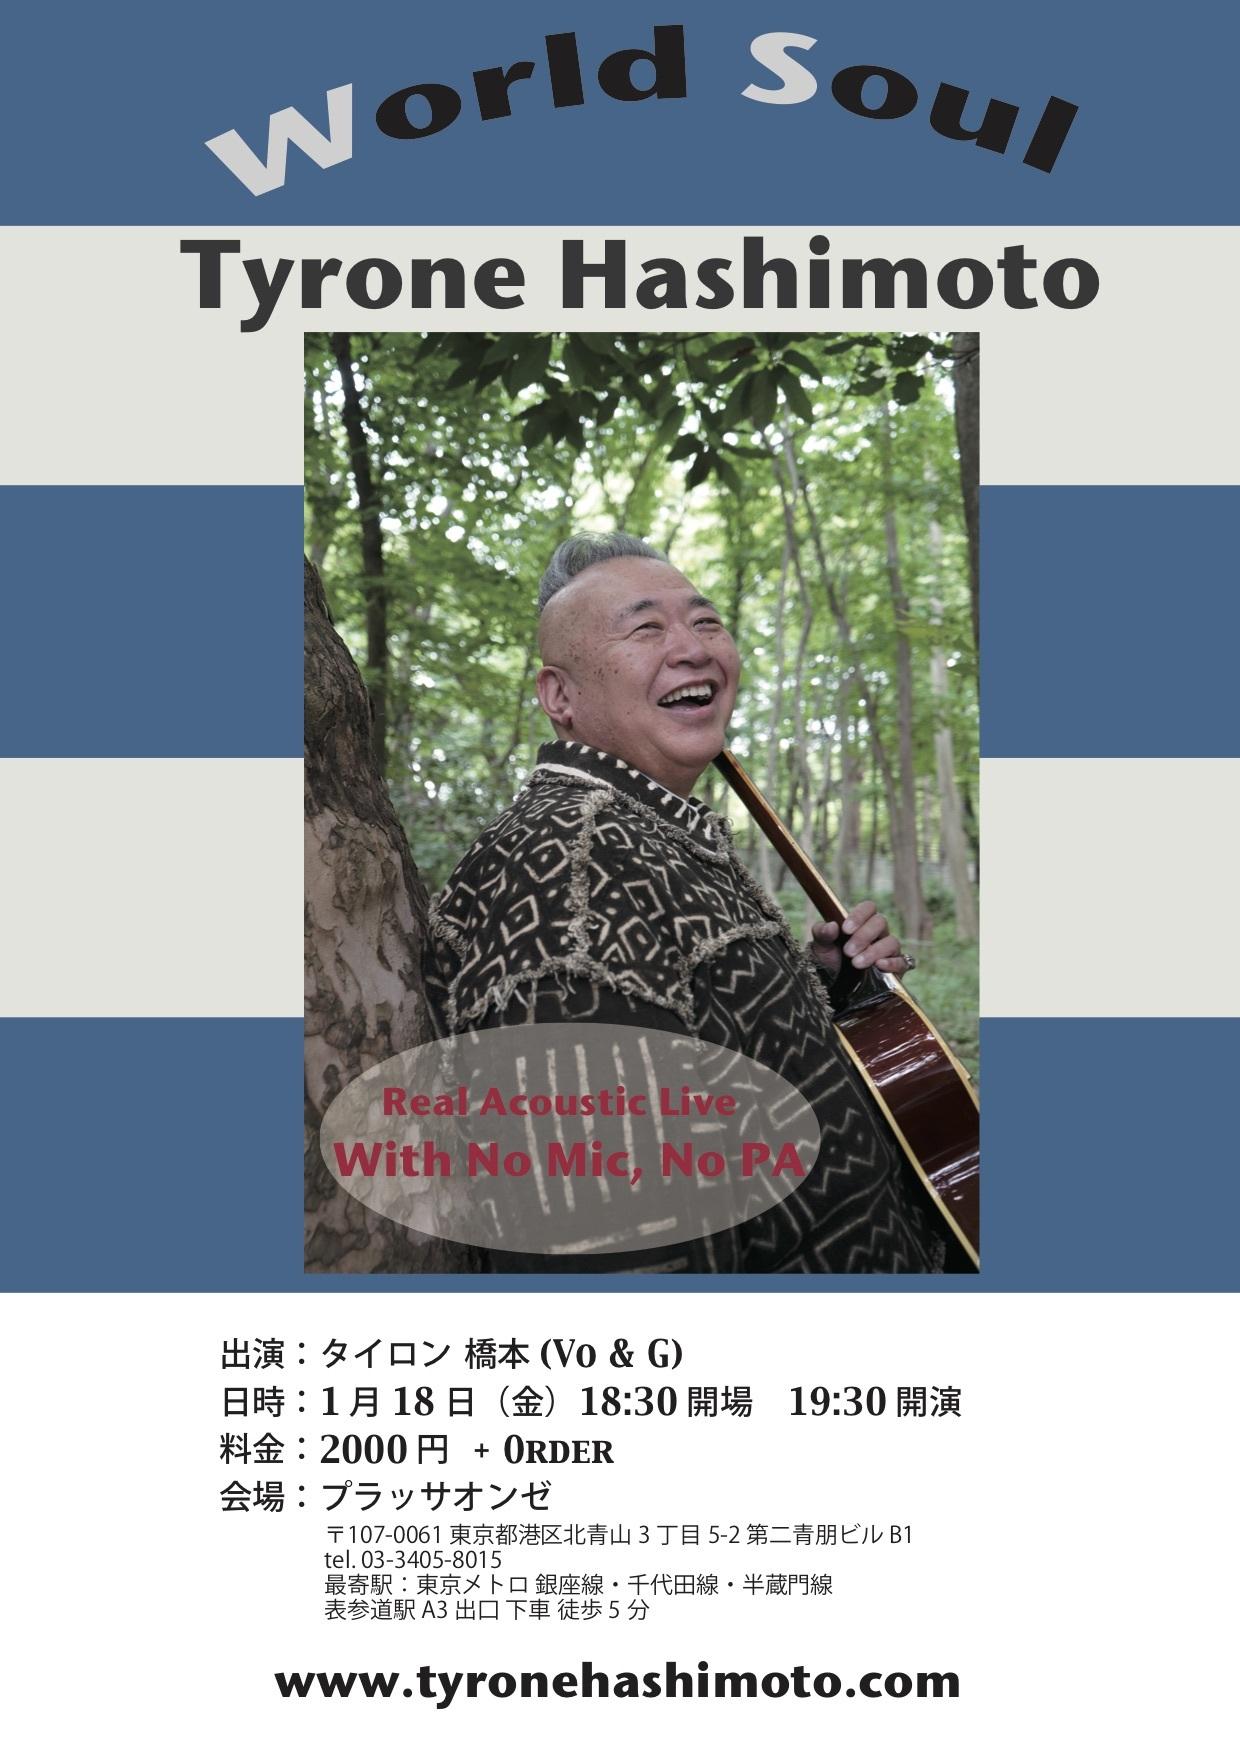 Tyrone Hashimoto 1月 ライブ情報_c0368808_18430175.jpg